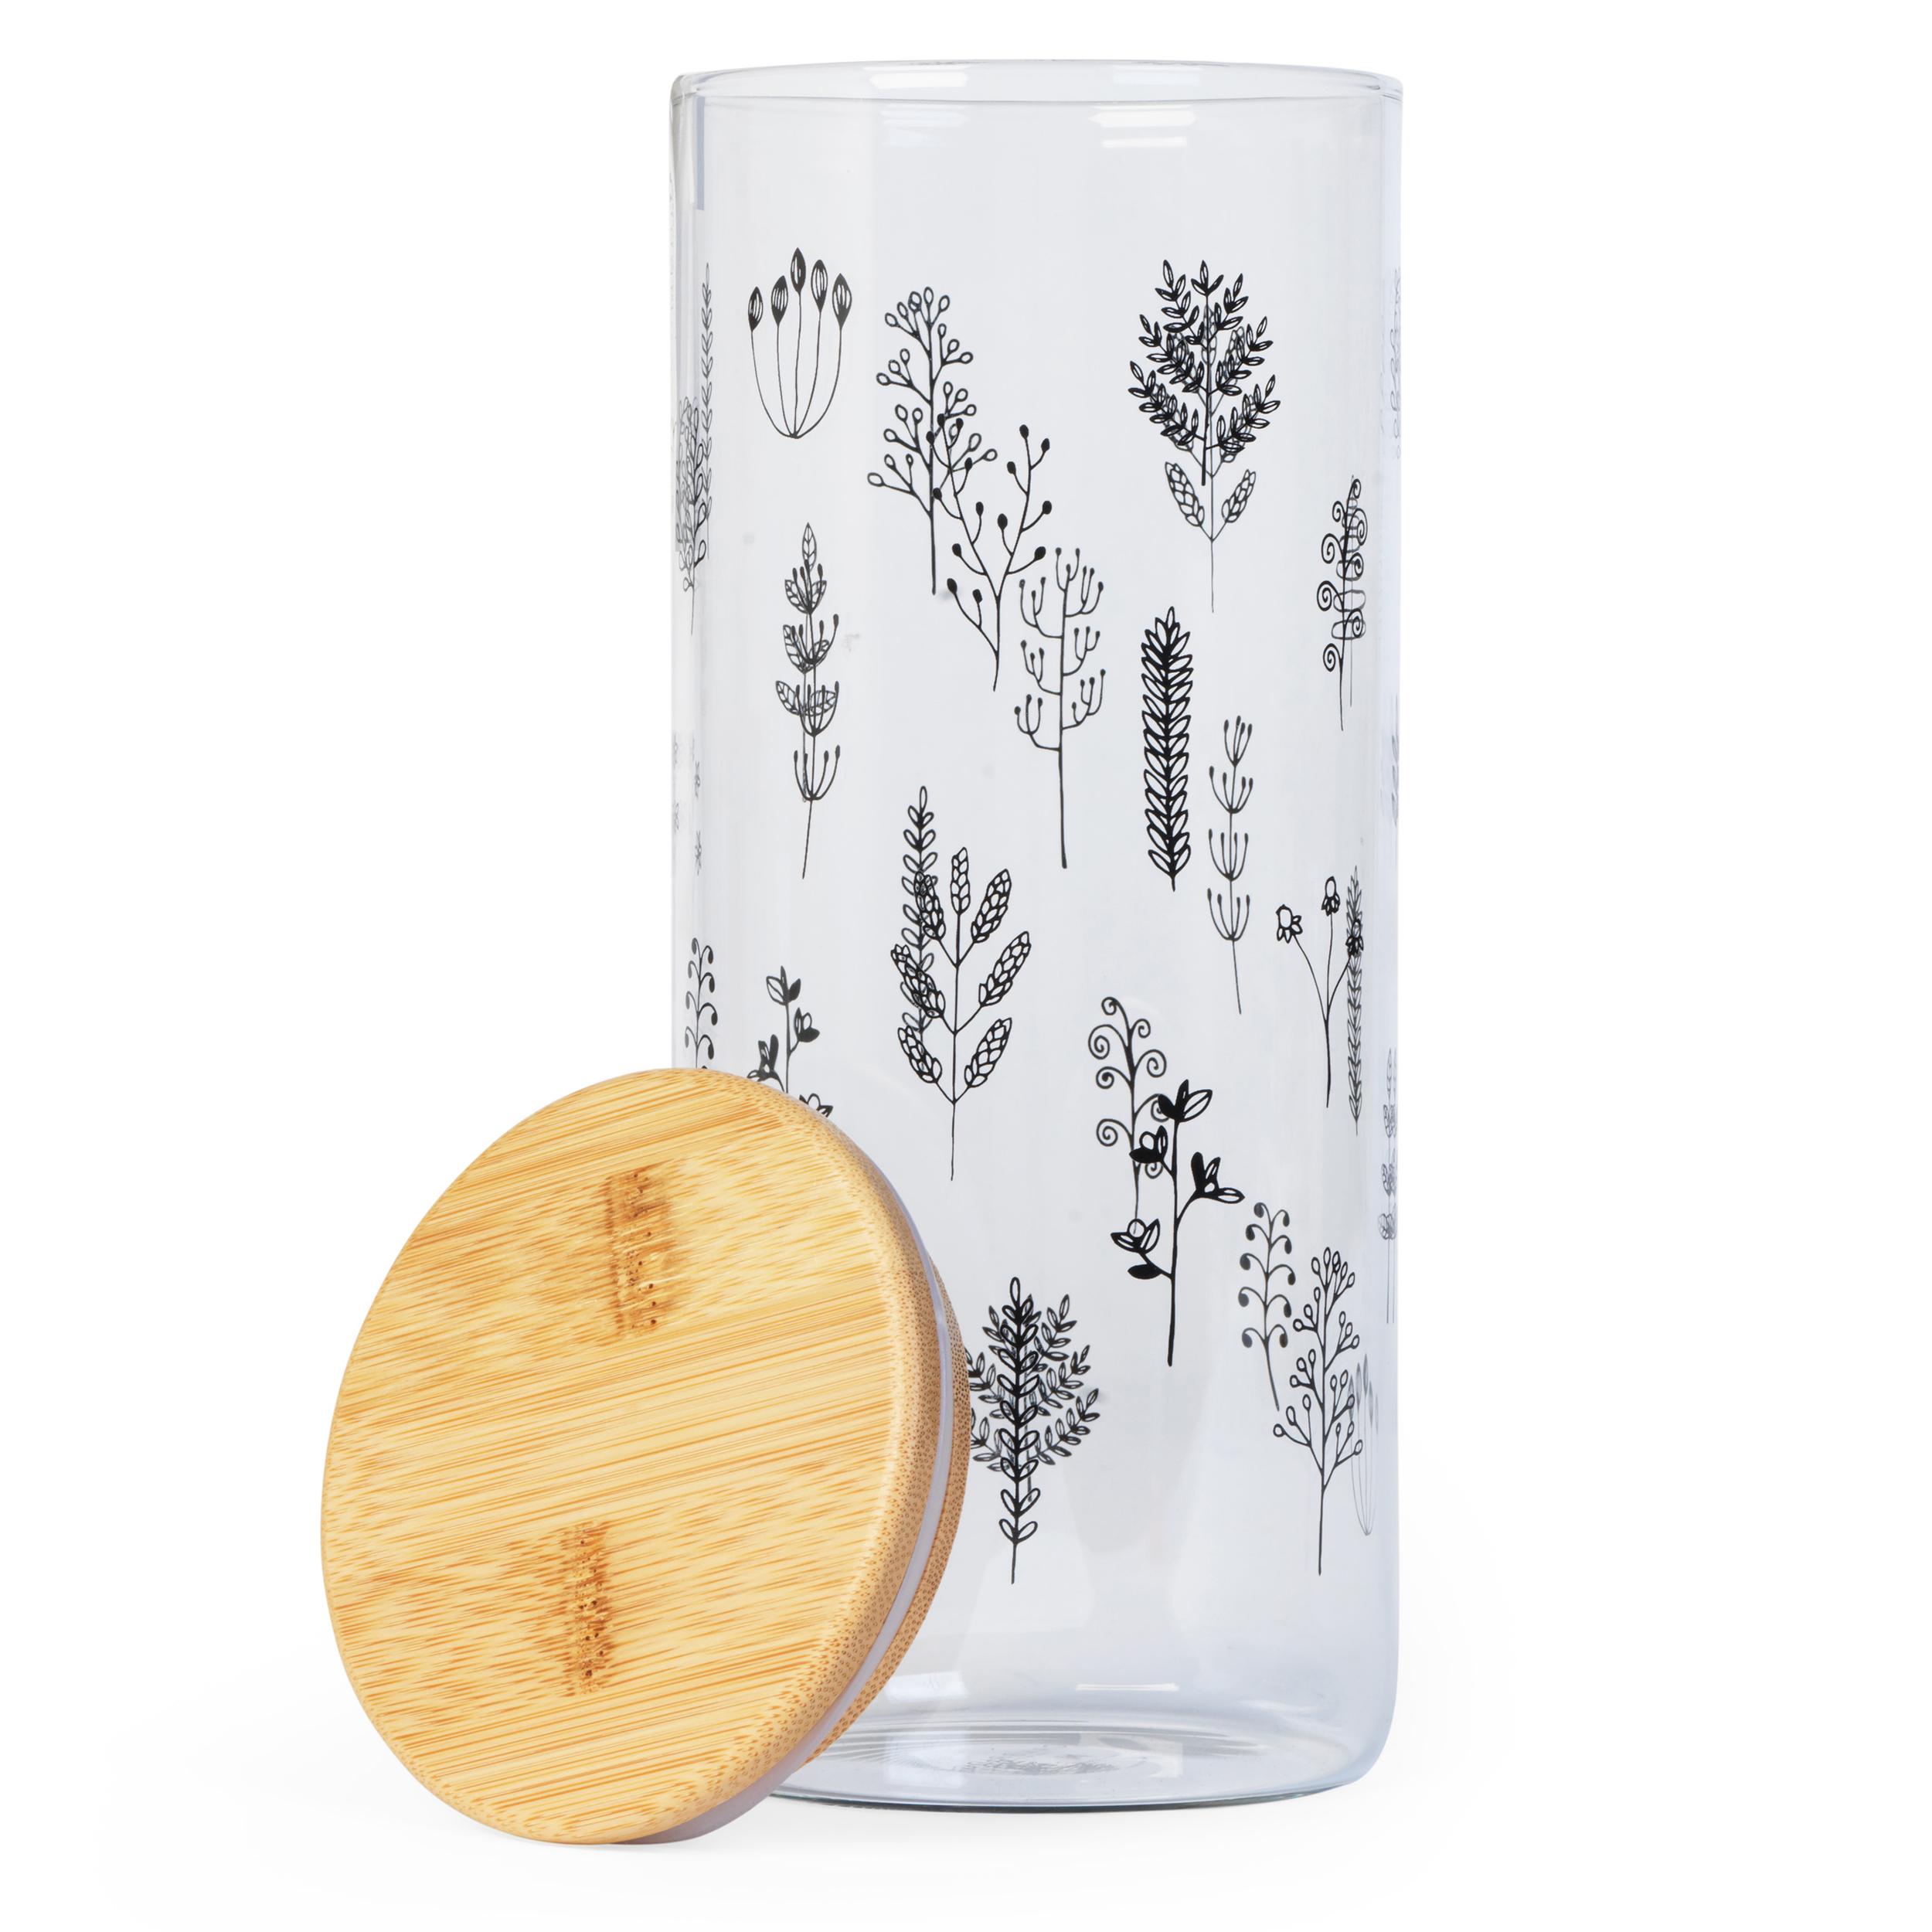 thumbnail 10 - Cambridge® Storage Preserving Glass Jar, 1200 ml, Spring Meadow/Doodle/Arielle